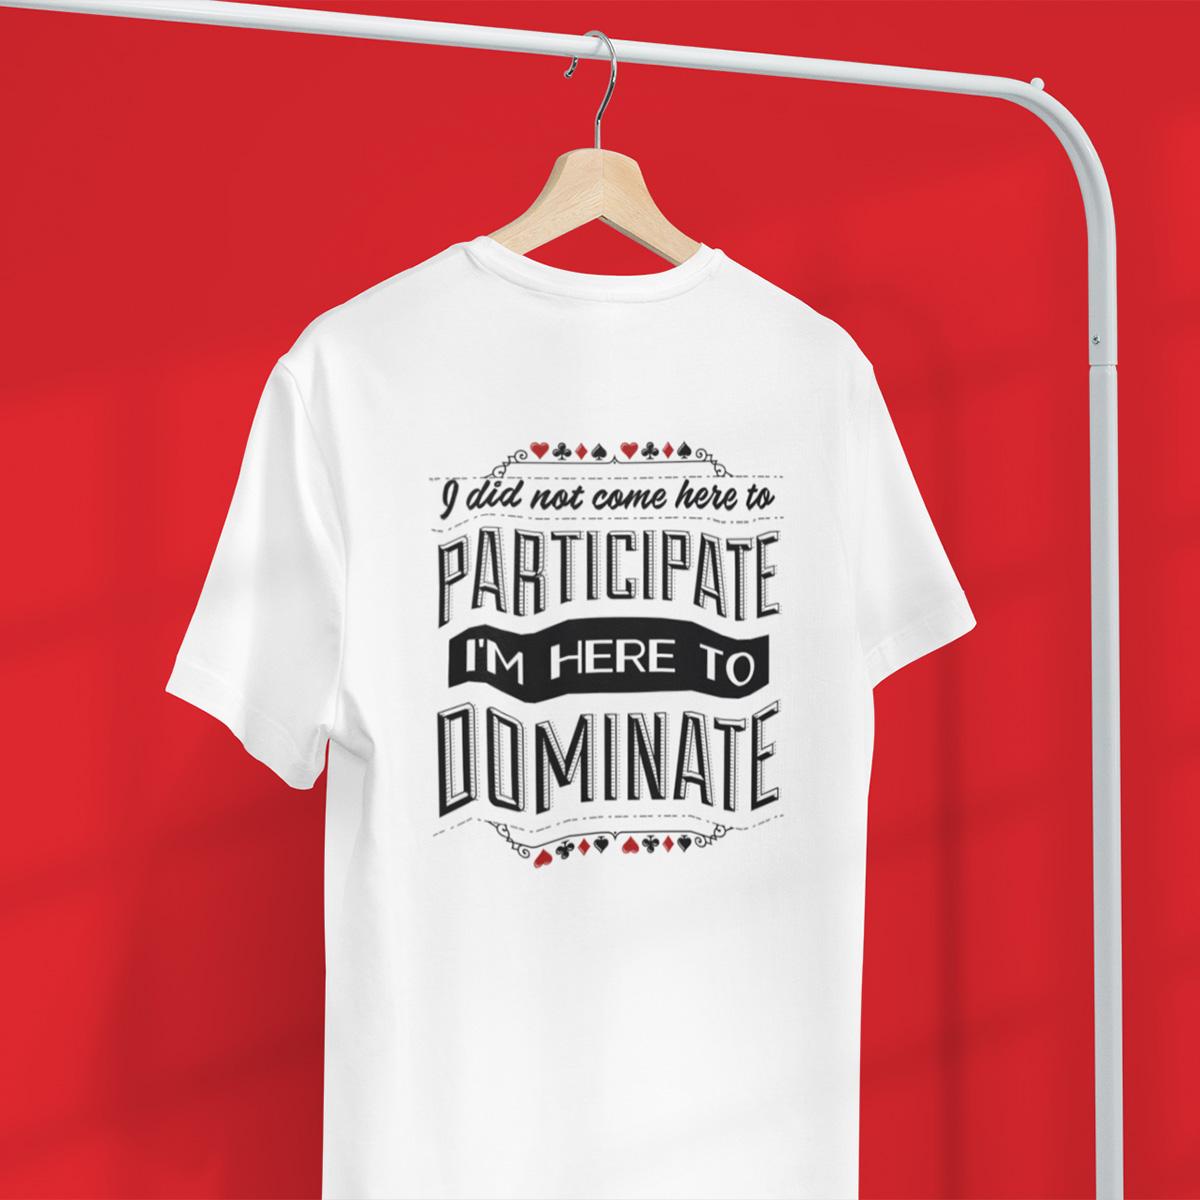 Here to Dominate Poker T-Shirt